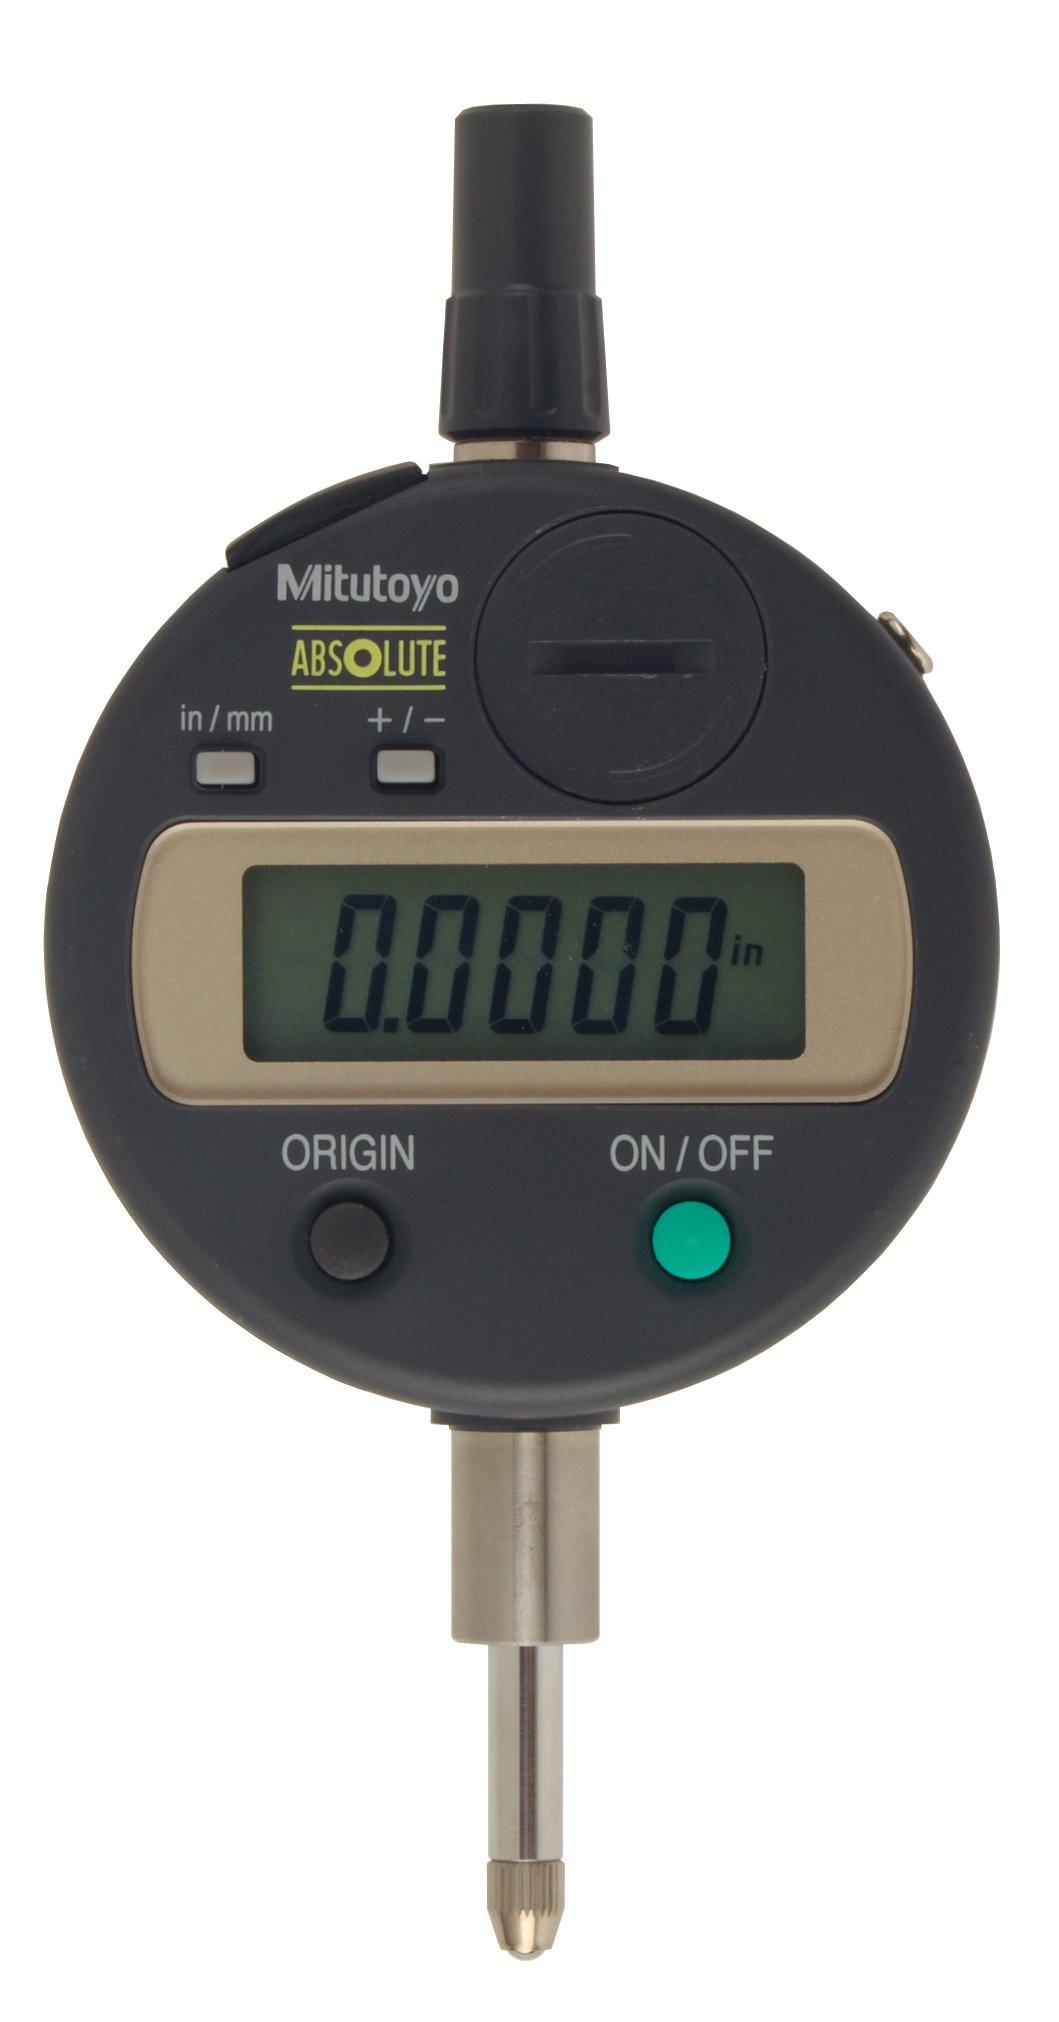 "Mitutoyo 543-791 Absolute LCD Digimatic Indicator ID-S, M2.5X0.45 Thread, 8mm Stem Dia., Lug Back, 0-0.5""/0-12.7mm Range, 0.00005""/0.001mm Graduation, +/-0.00012"" Accuracy"